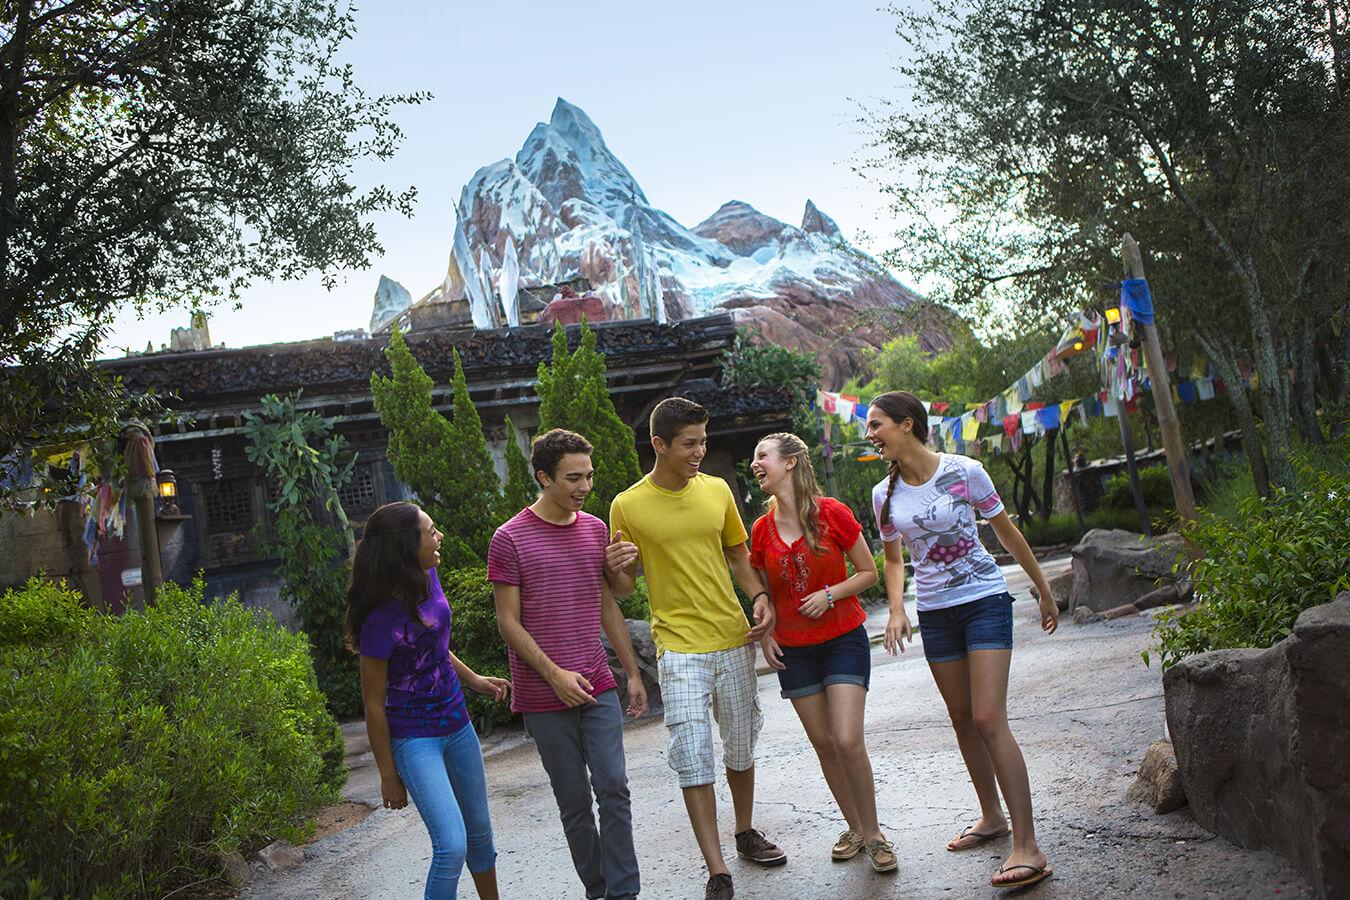 Disney and Legoland Florida Combo Ticket (7 Parks)